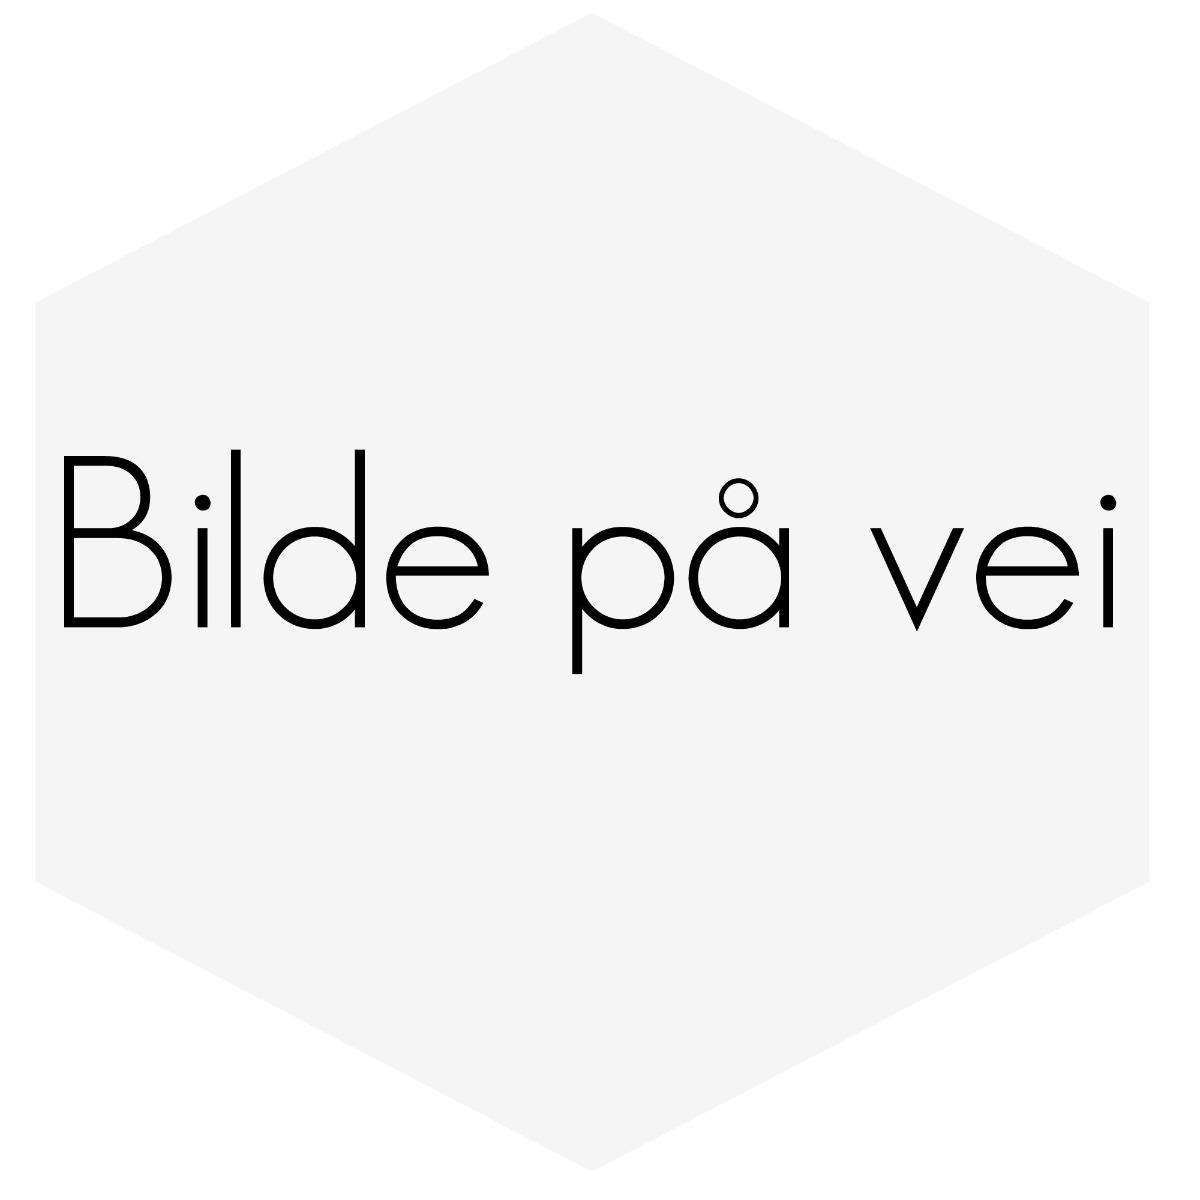 VANNPUMPE TIL VOLVO 260(262,264,265) , B27 76-78   1218096